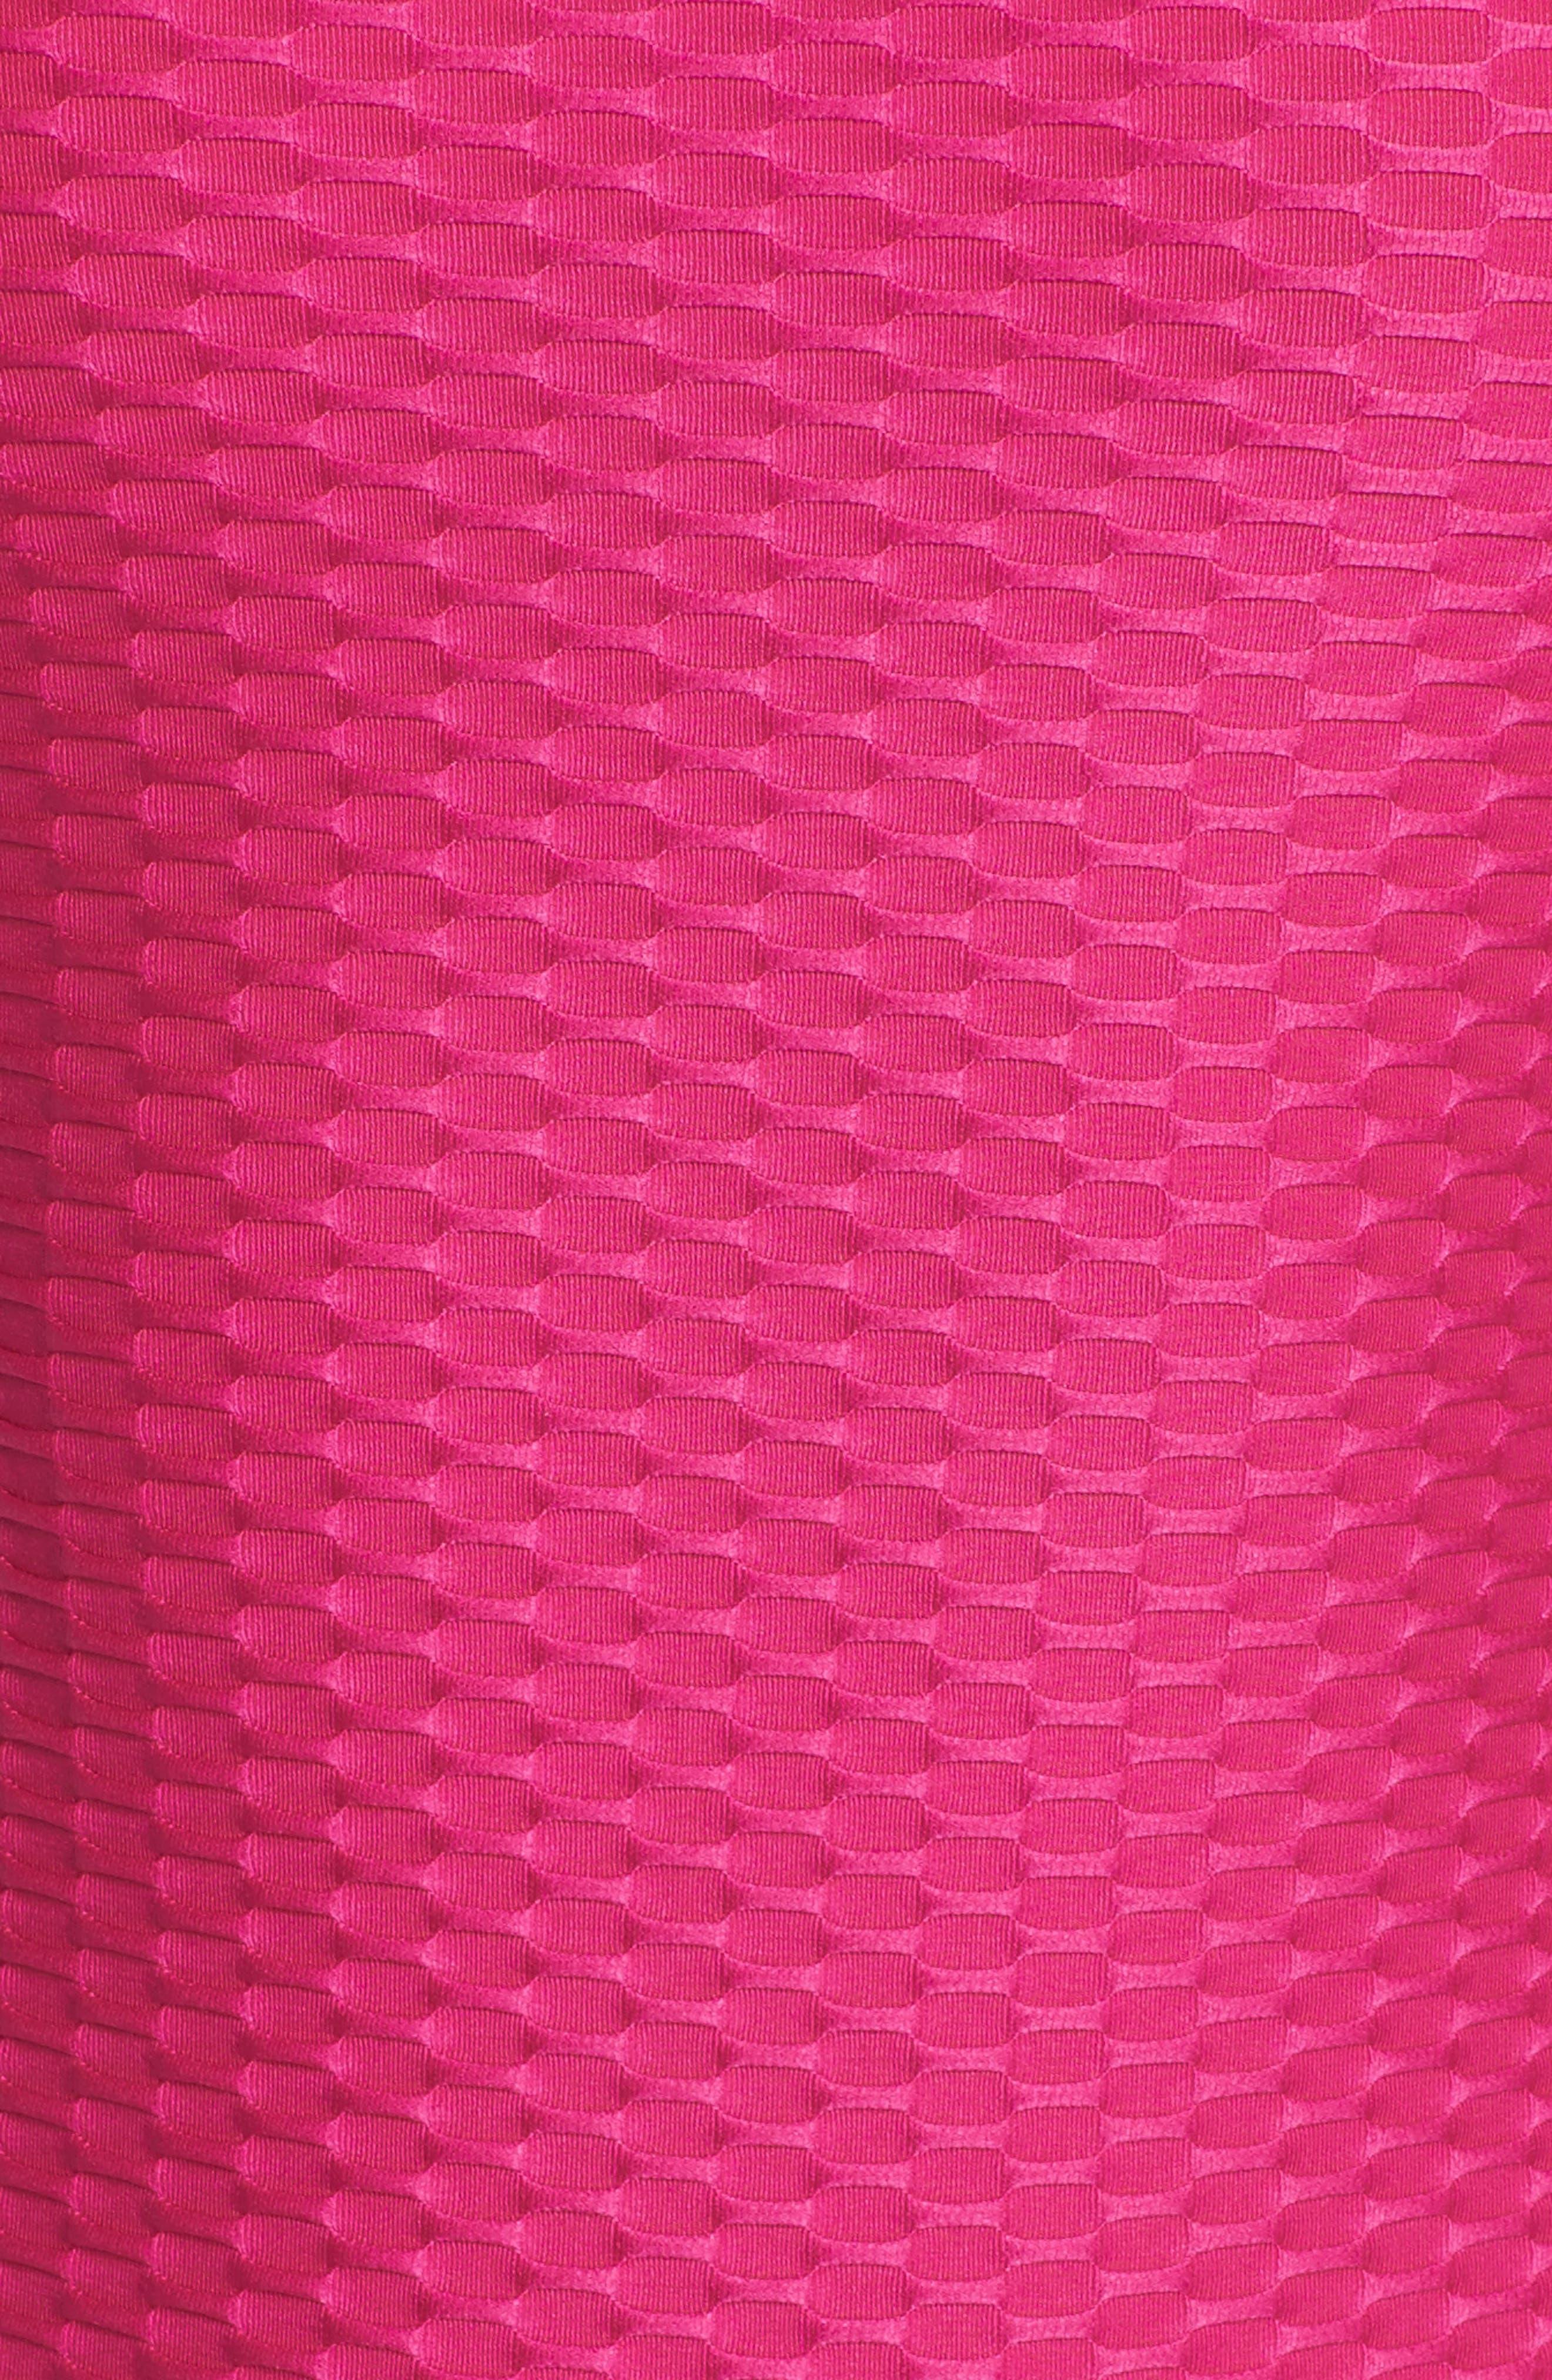 Long Sleeve One-Piece Swimsuit,                             Alternate thumbnail 5, color,                             Fuchsia